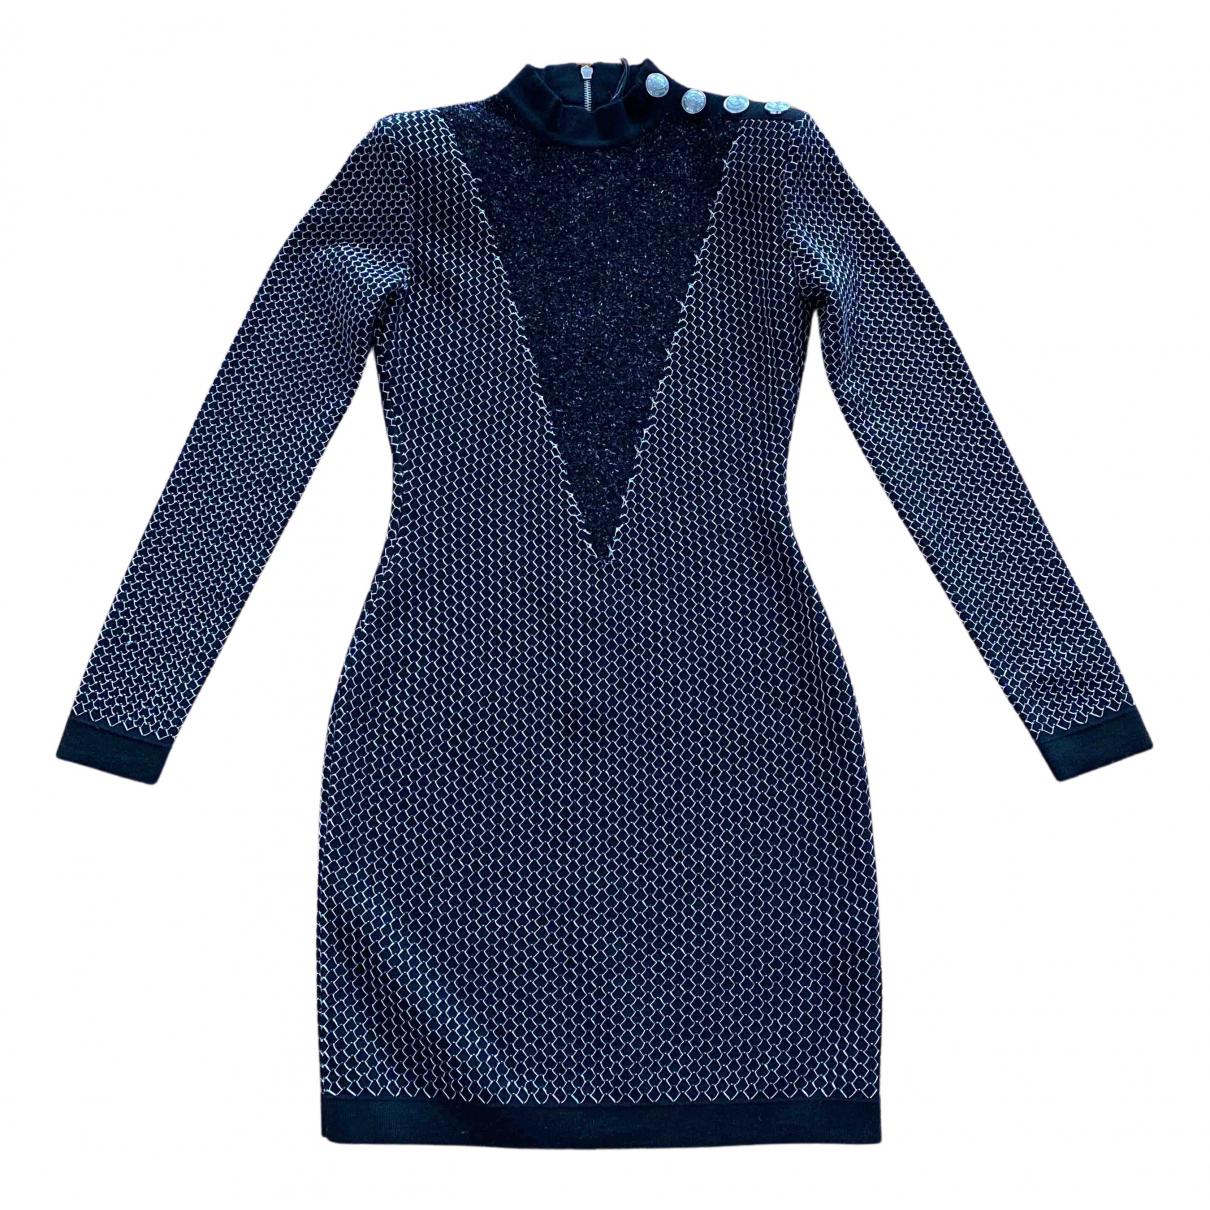 Balmain N Blue Wool dress for Women 36 FR